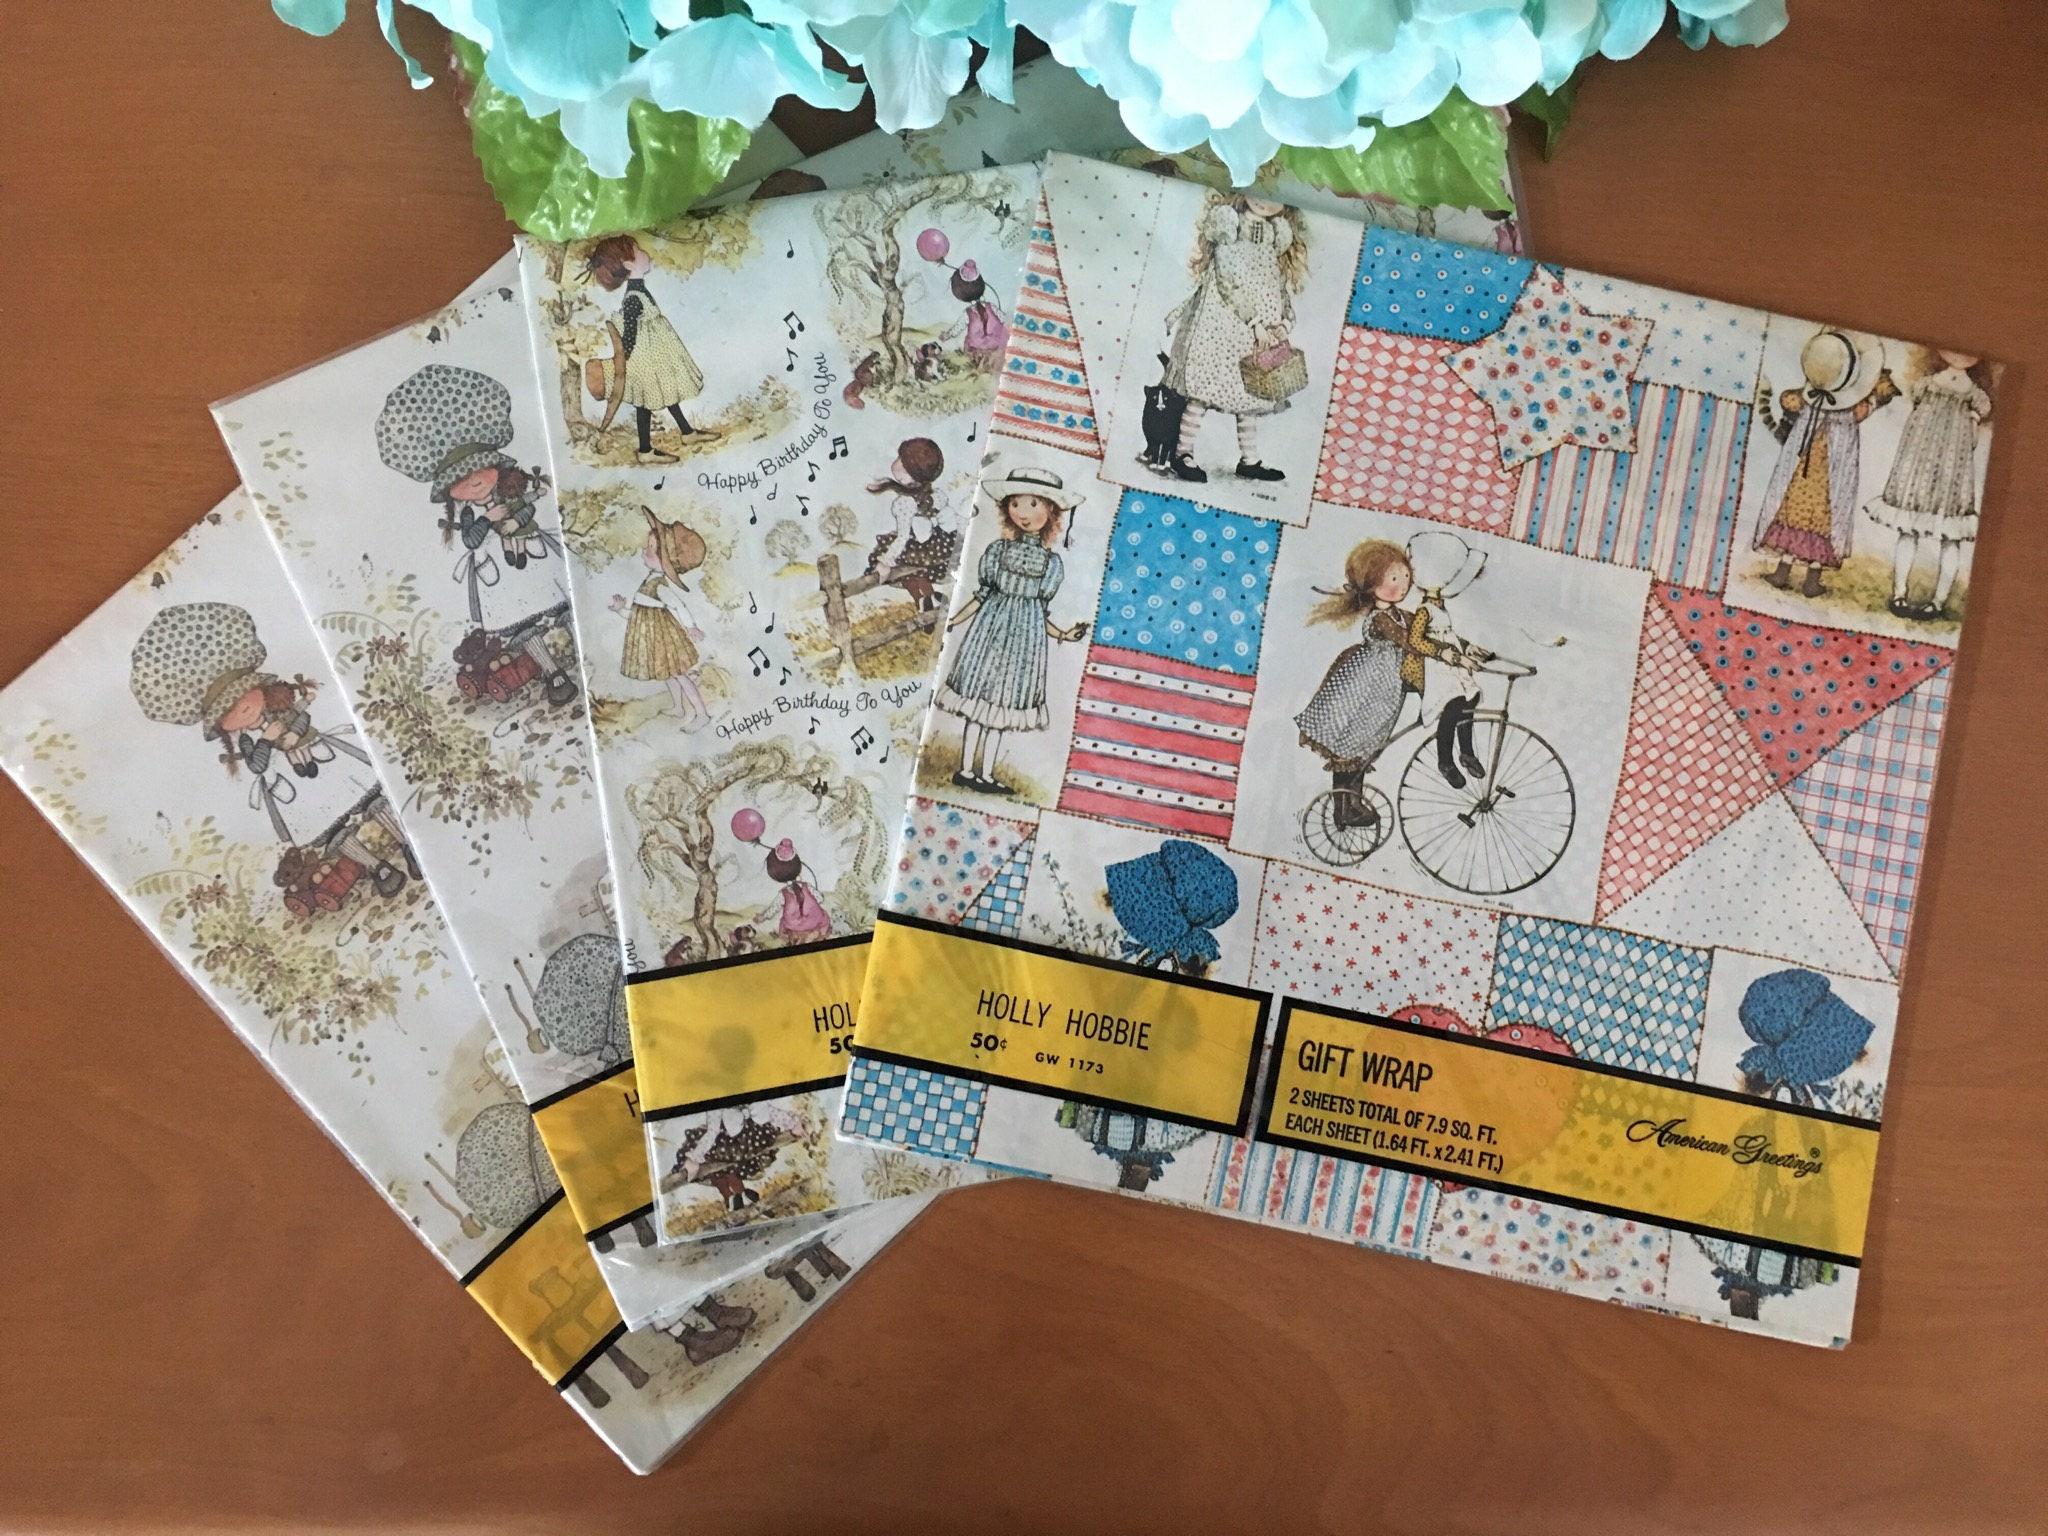 American Greetings Holly Hobbie Gift Wrap 4 Packages New Etsy